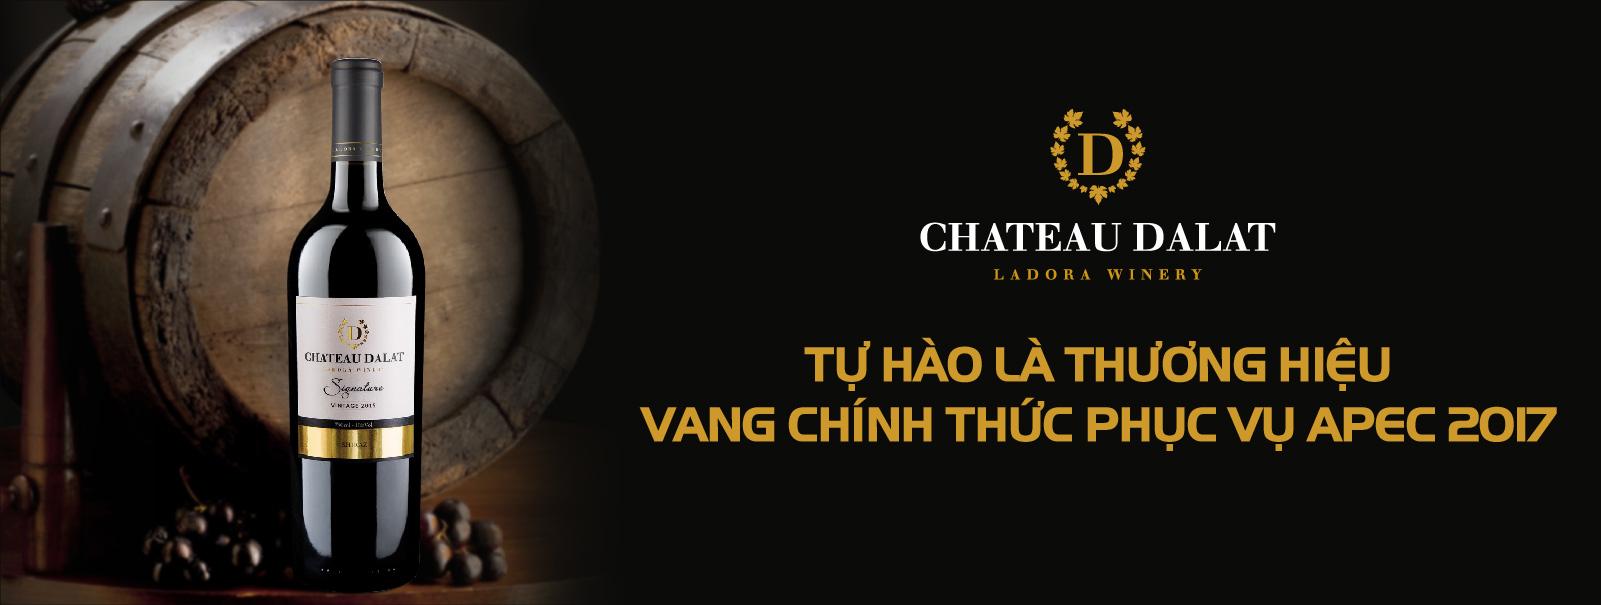 Gioi thieu Chateau 1600x604 px 02-01